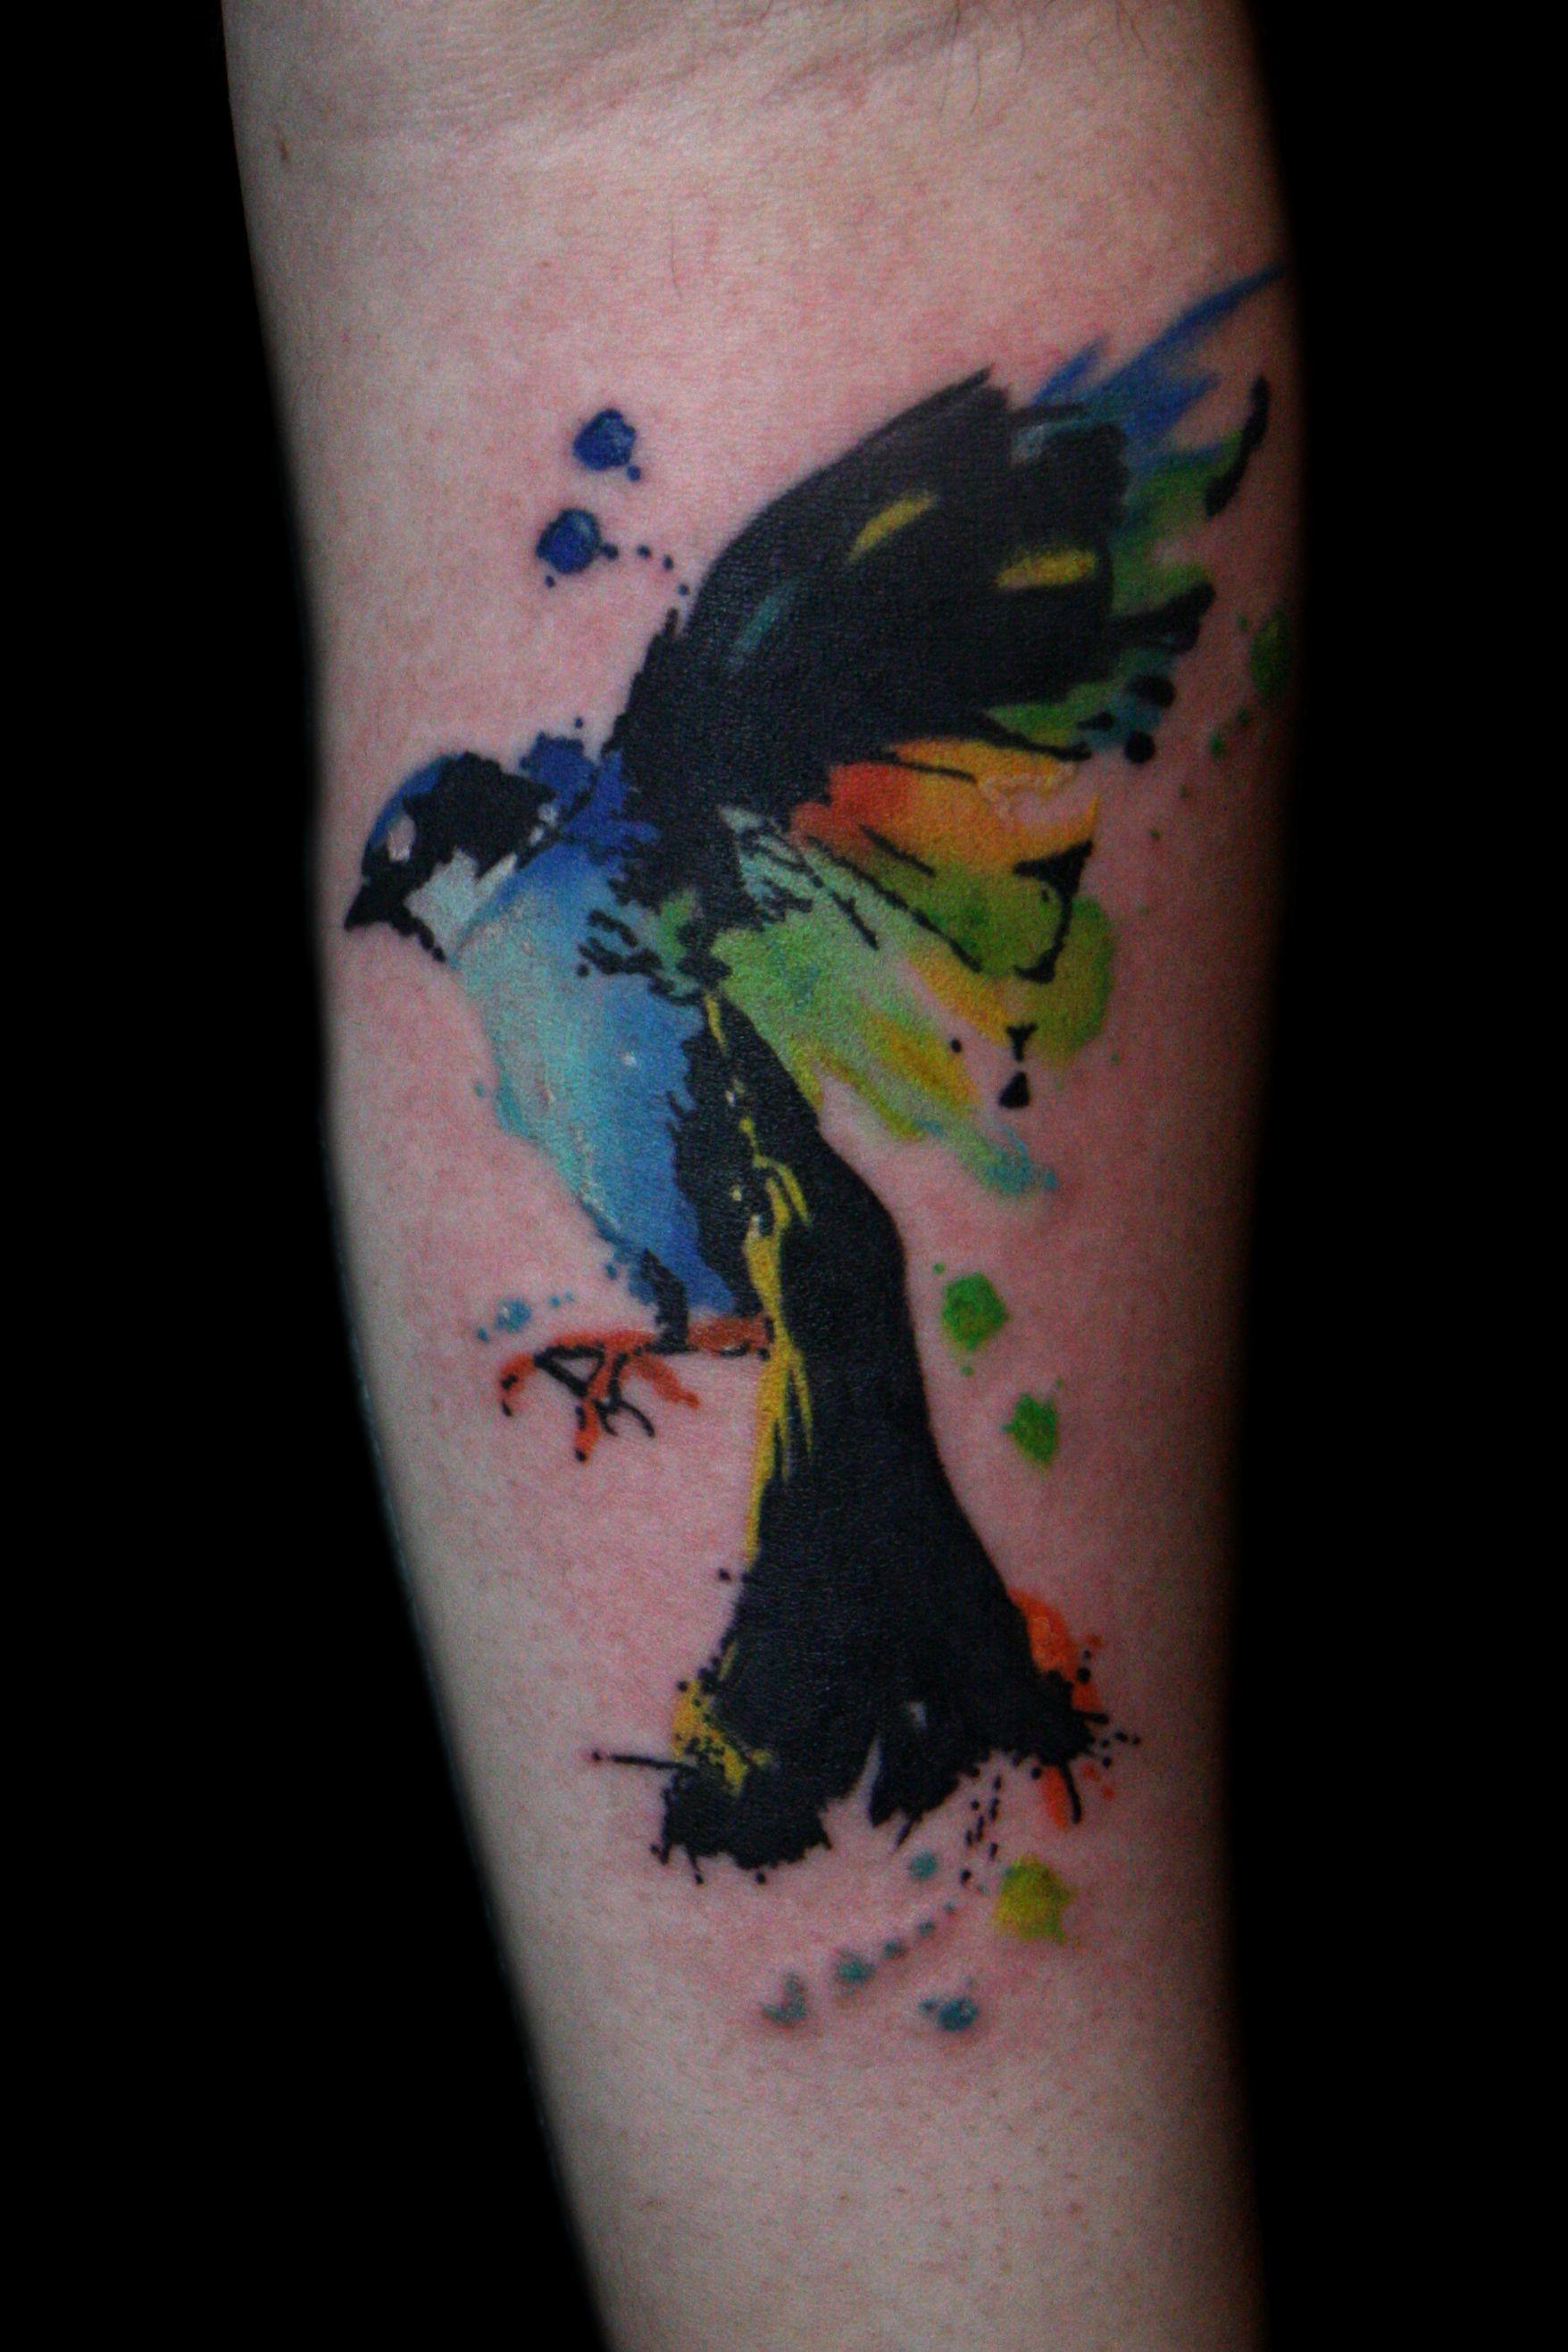 colorful watercolor bird tattoo Colorful bird tattoos